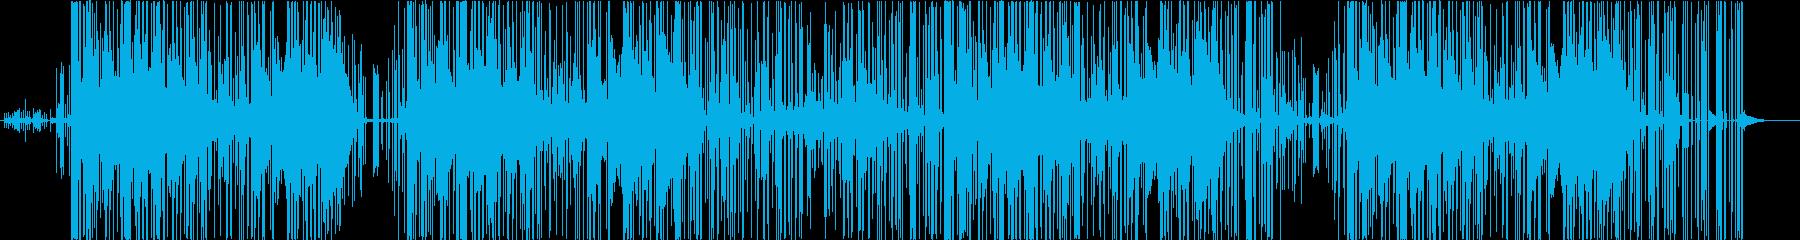 TRAP_民族的でインダストリアルの再生済みの波形